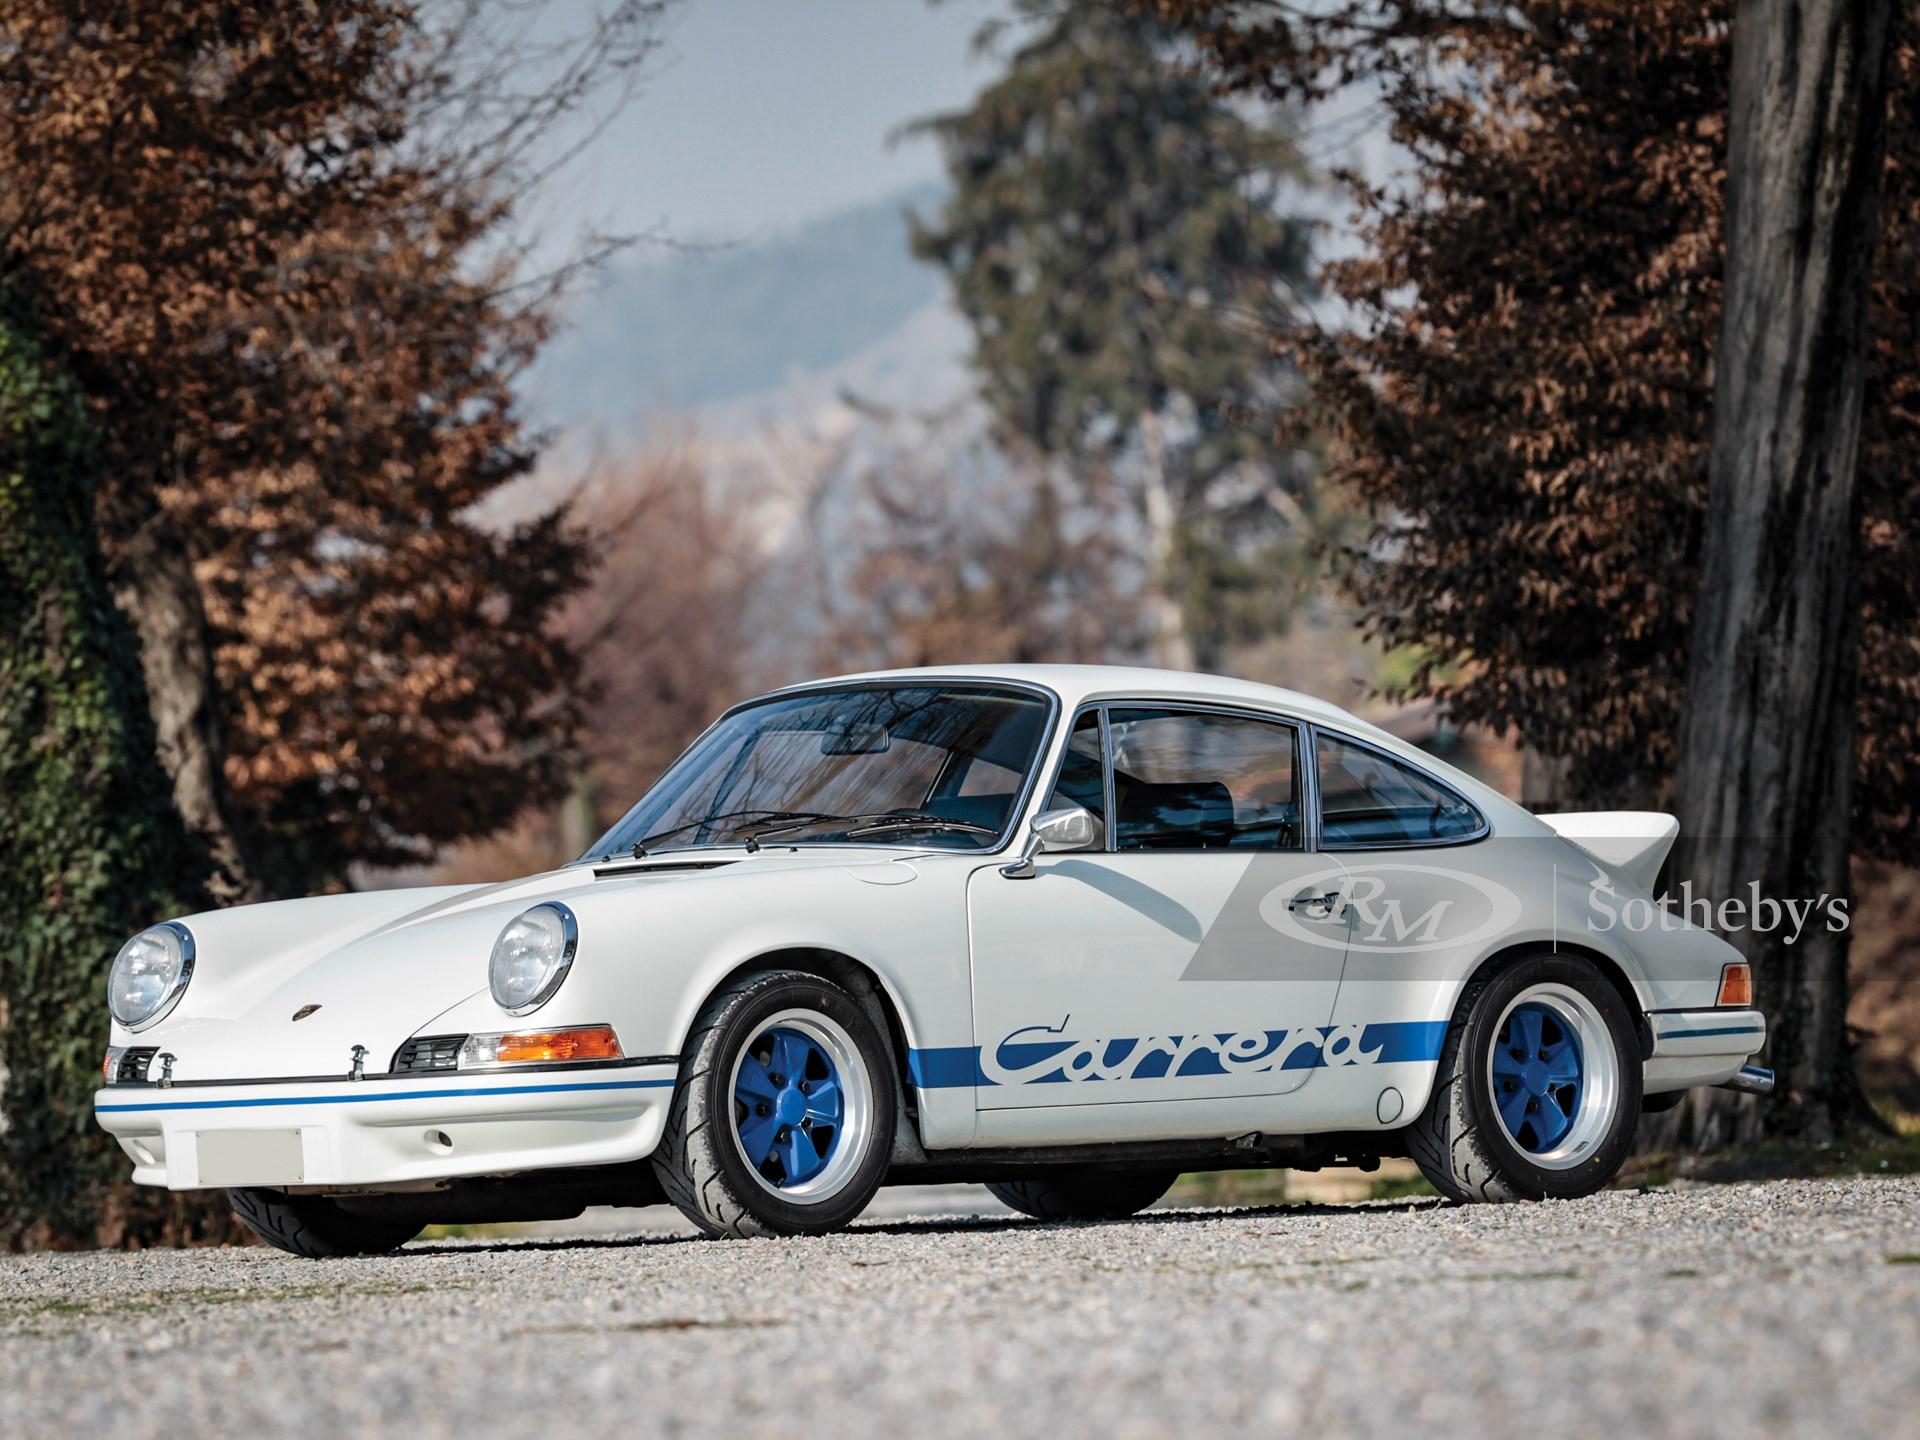 1973 Porsche 911 Carrera Rs 2 7 Touring Essen 2019 Rm Sotheby S